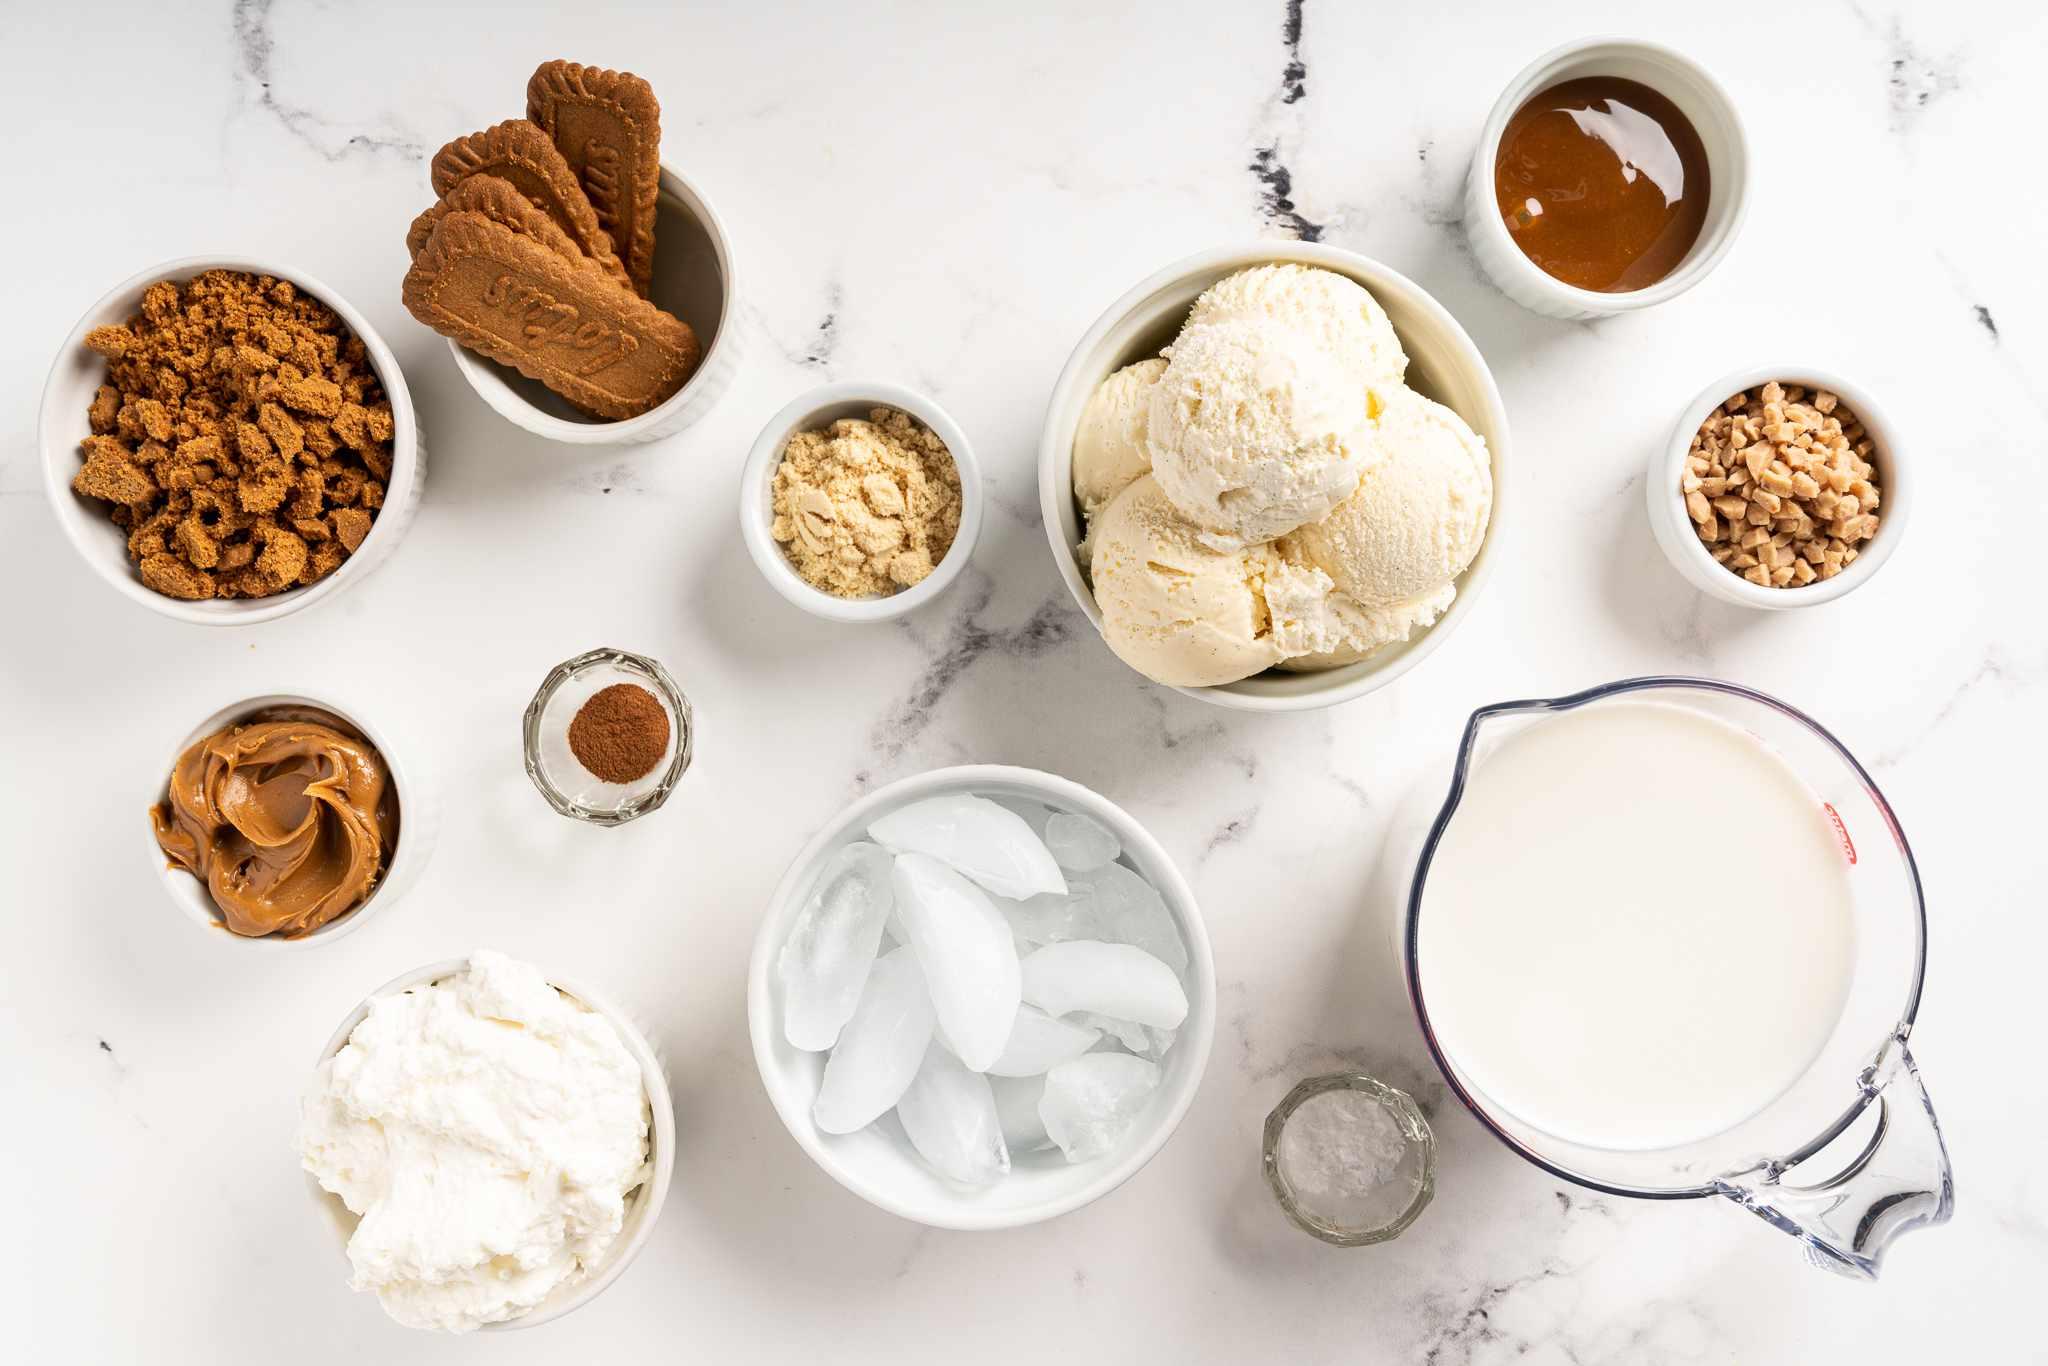 Toffee and Salted Caramel Biscoff Malted Milkshake